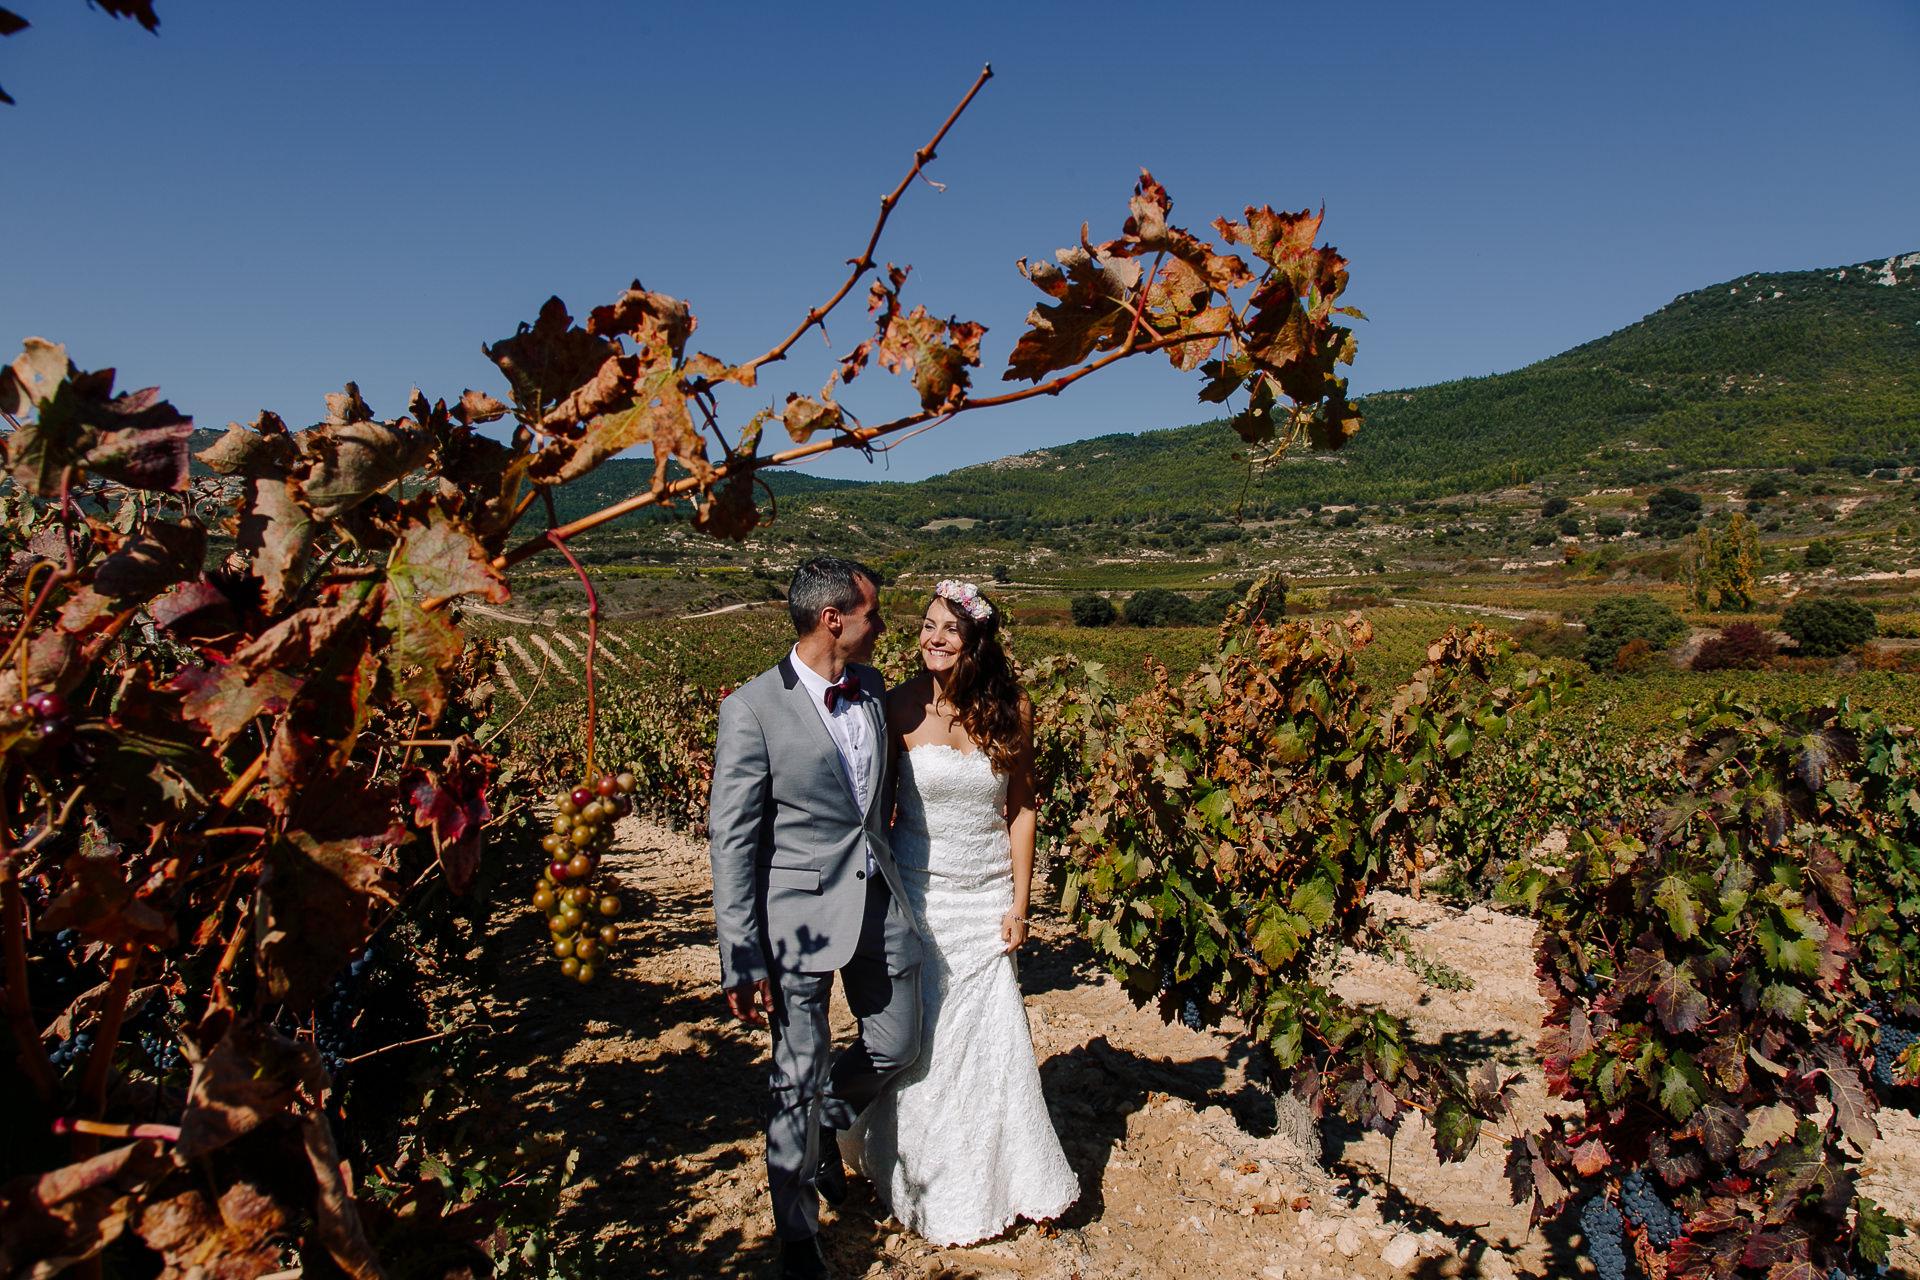 boda civil vinedos larioja lola berantevilla 143650